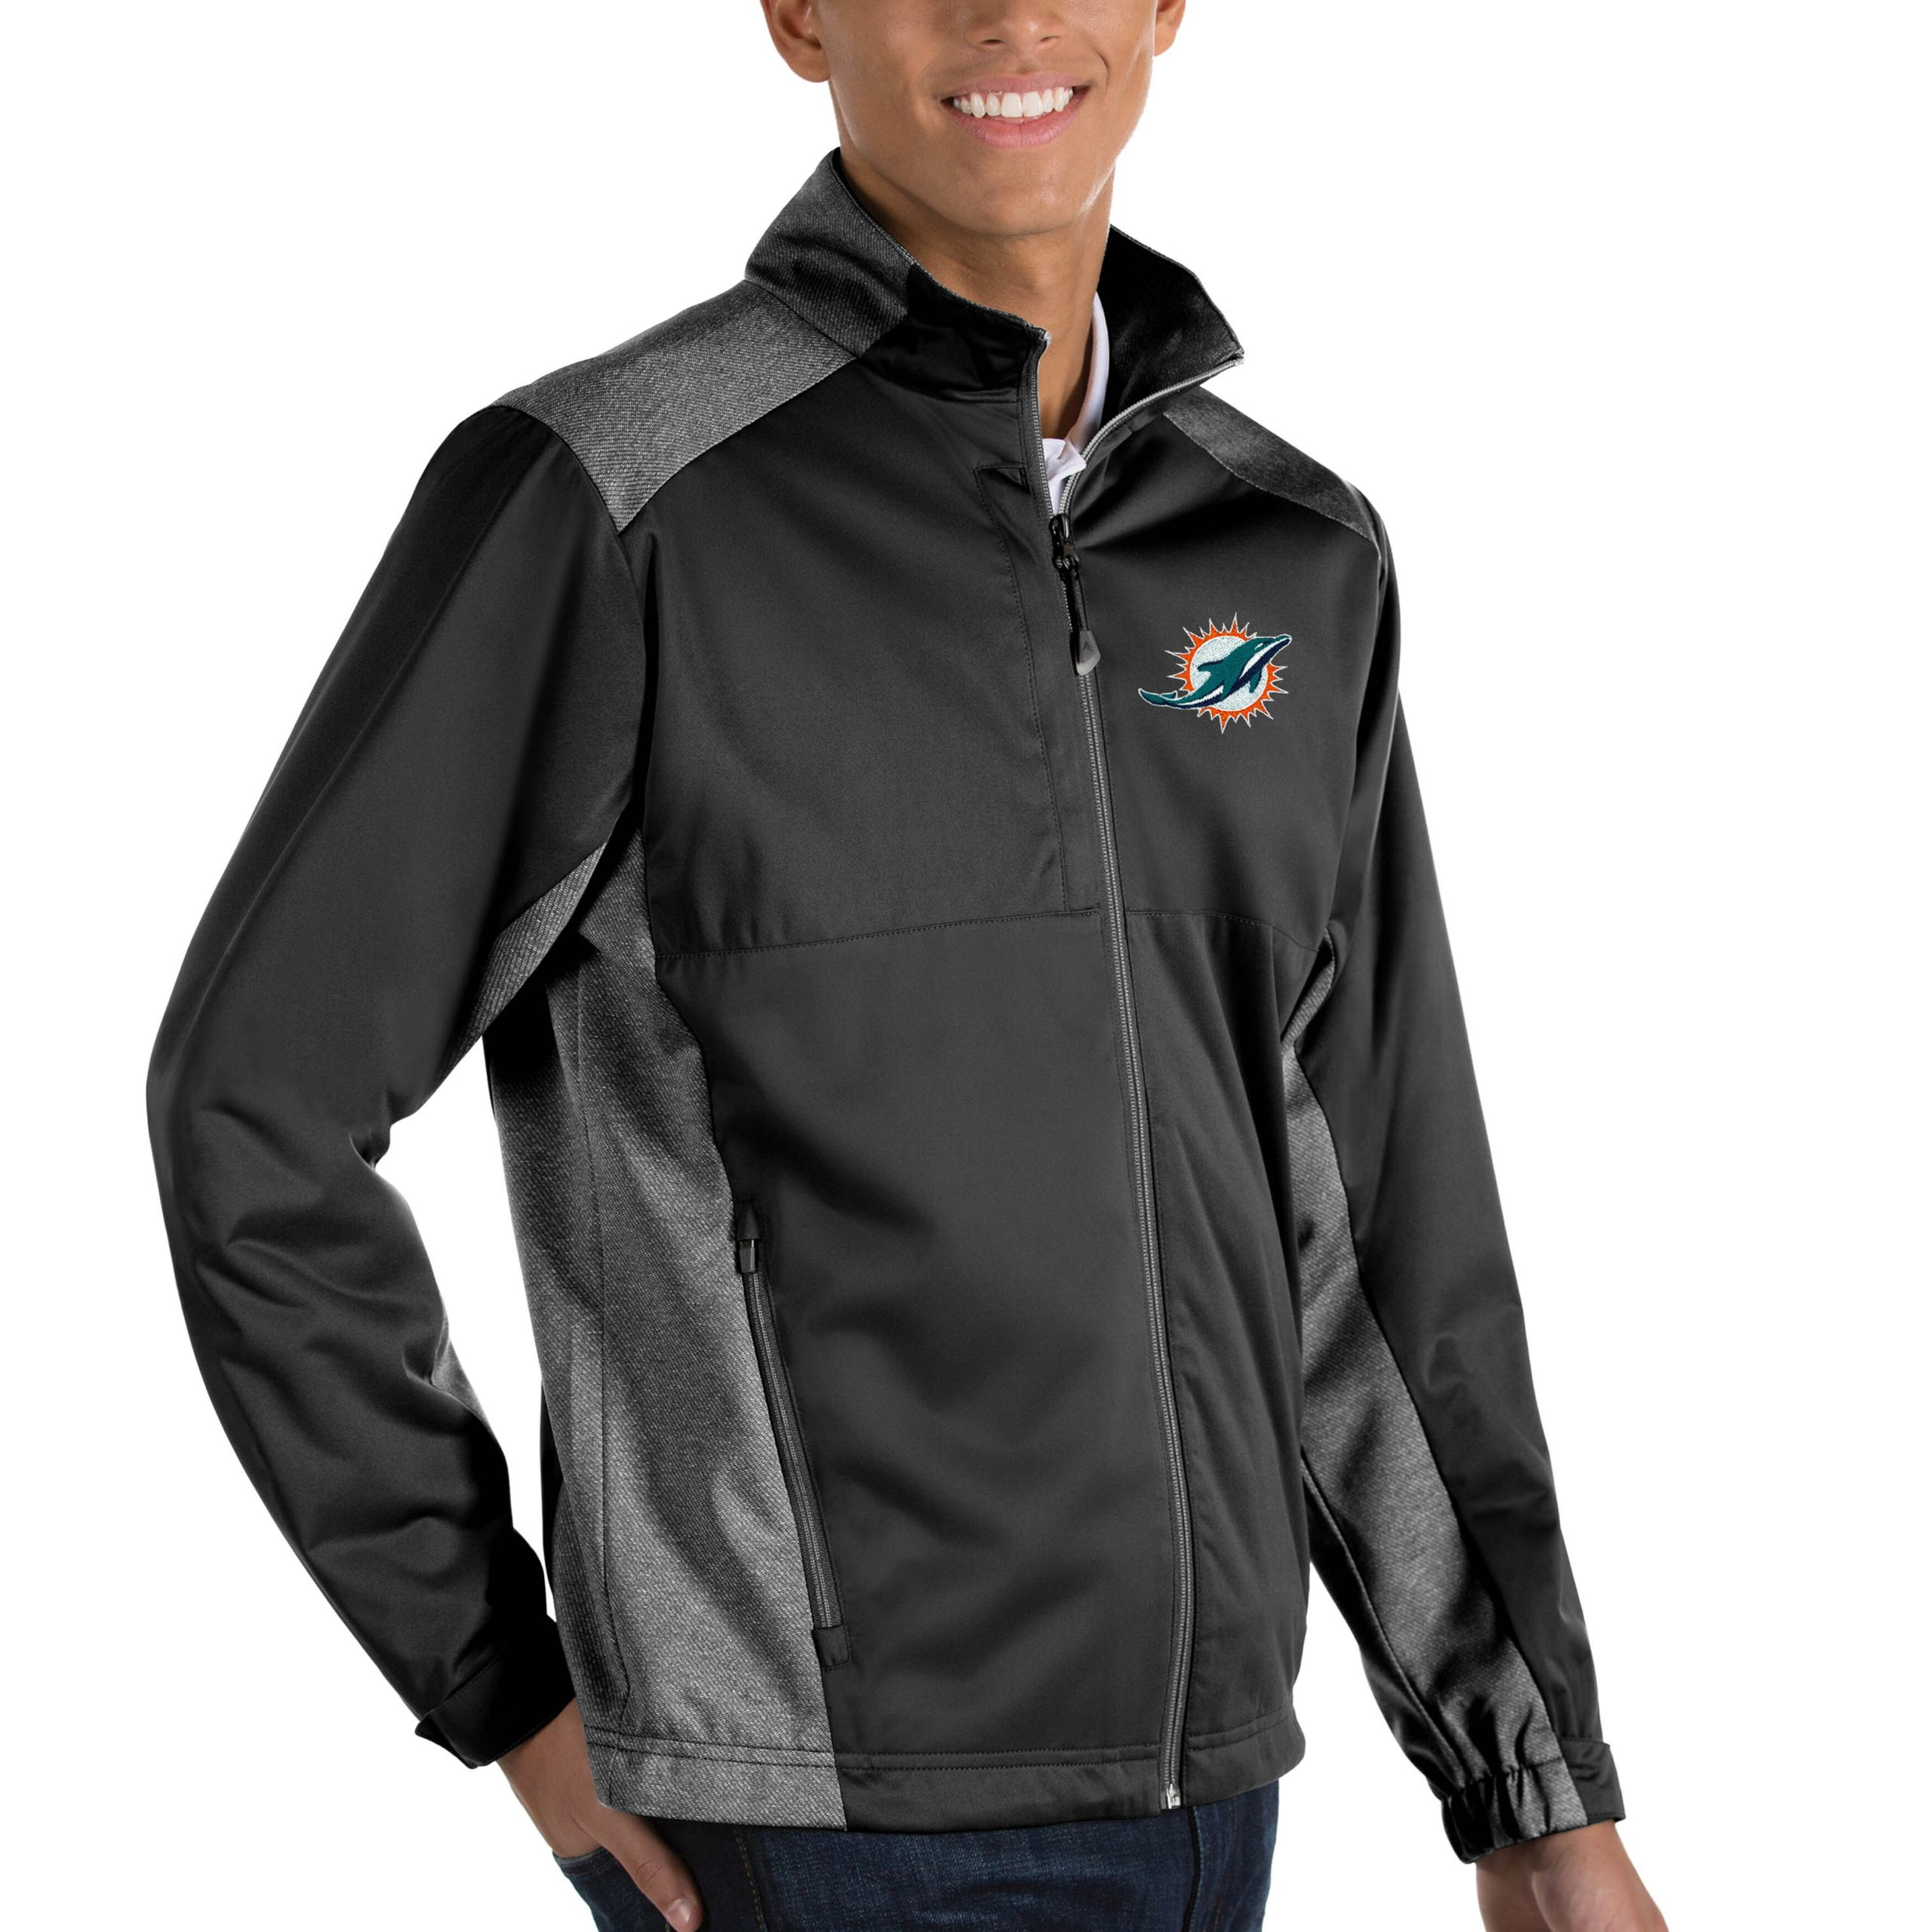 Miami Dolphins Antigua Revolve Big & Tall Full-Zip Jacket - Heather Black